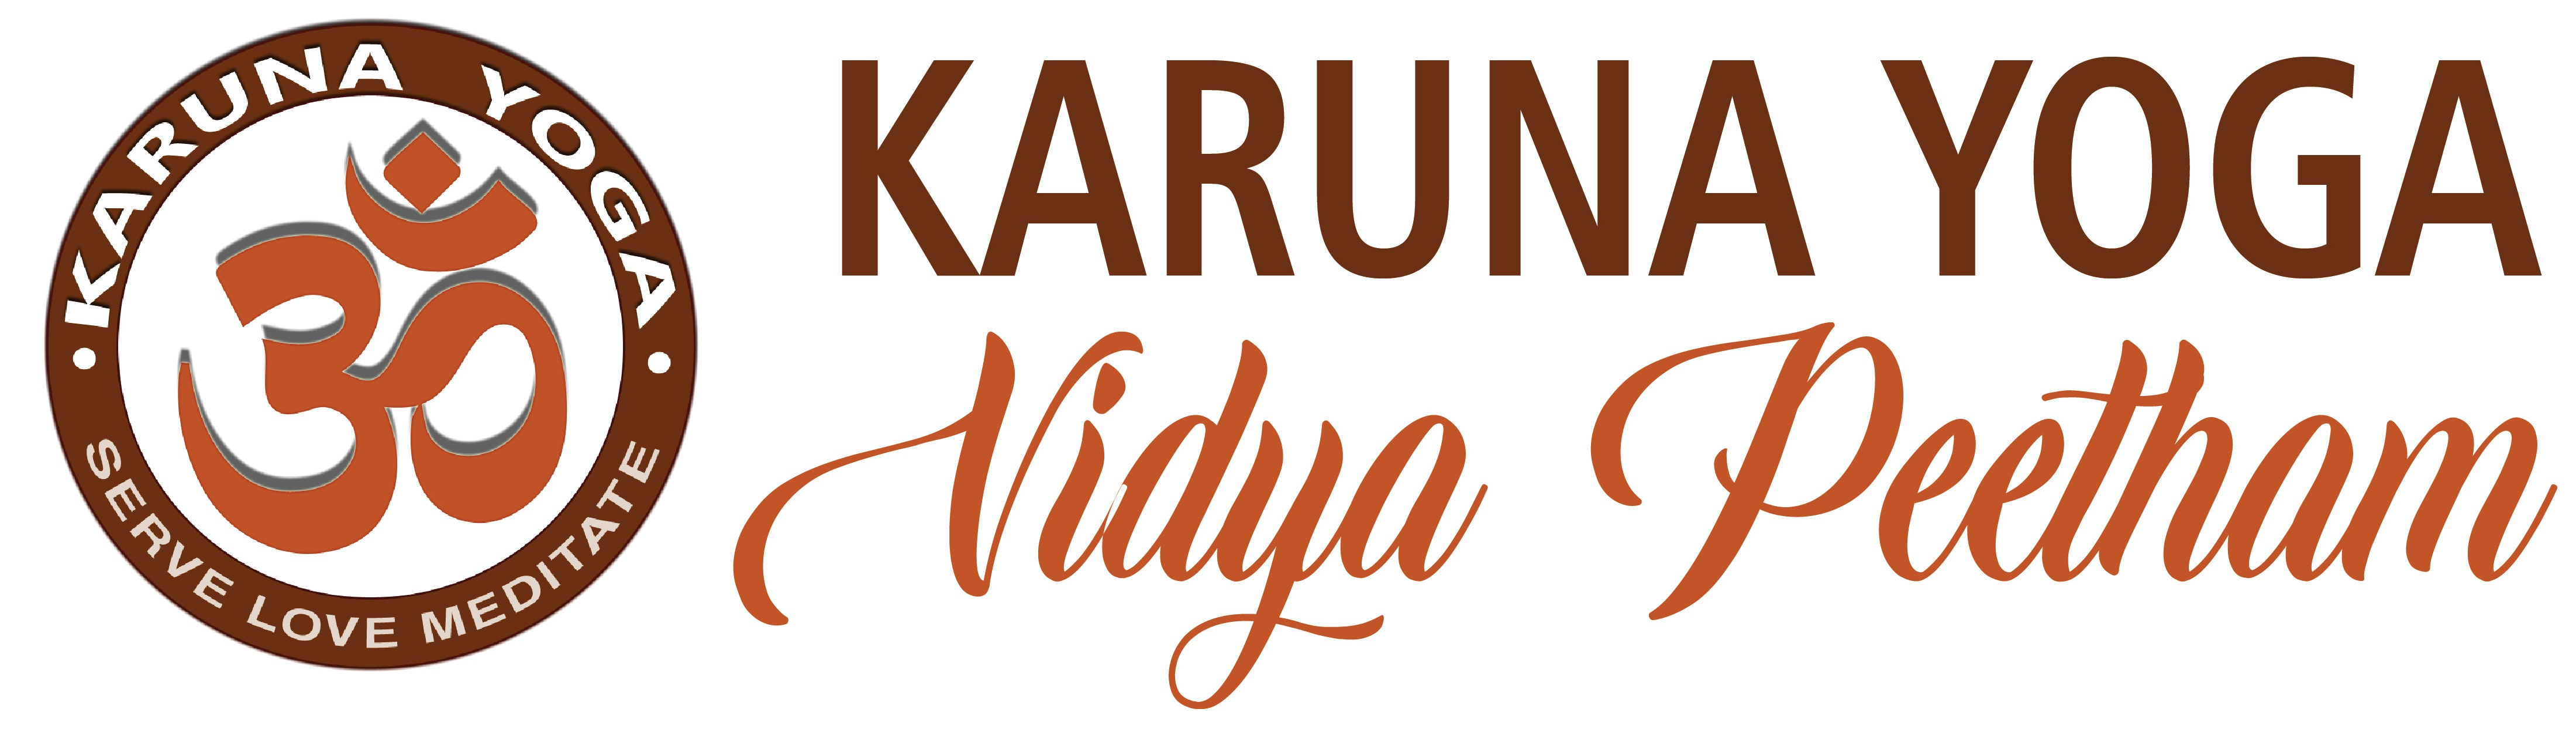 Karuna Yoga Vidya Peetham